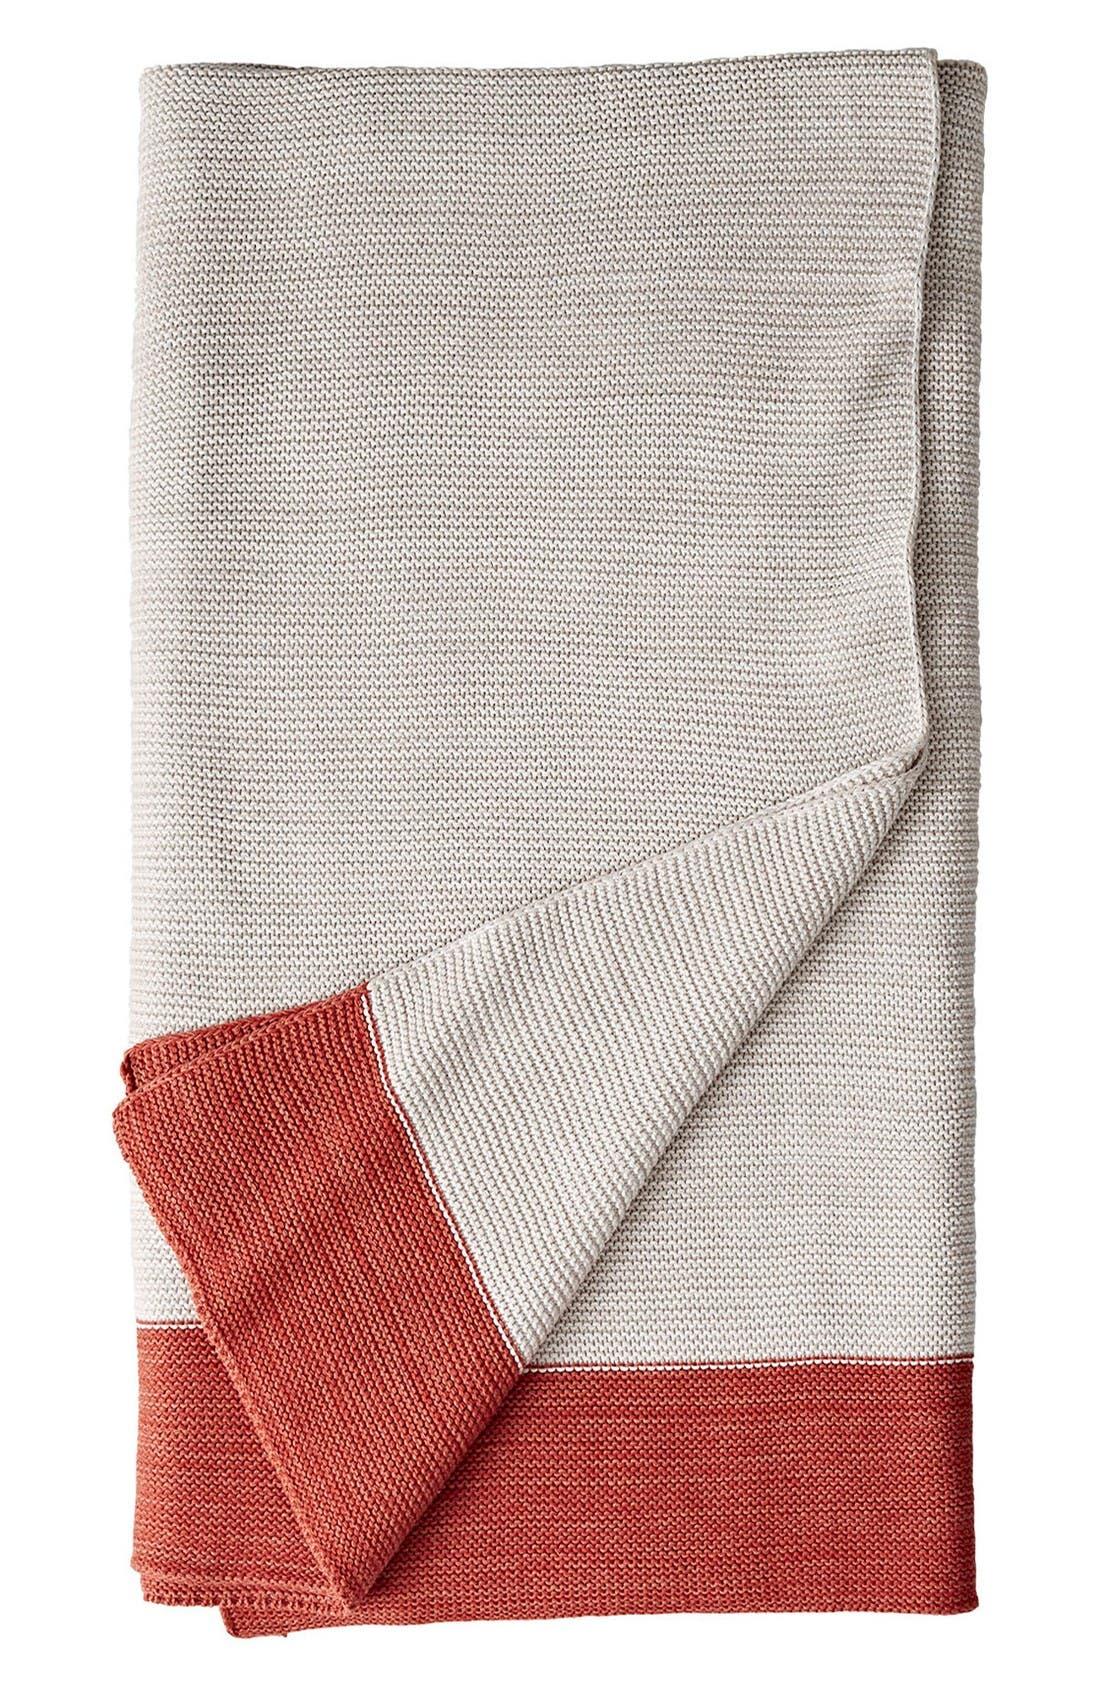 Main Image - DwellStudio Marled Knit Throw